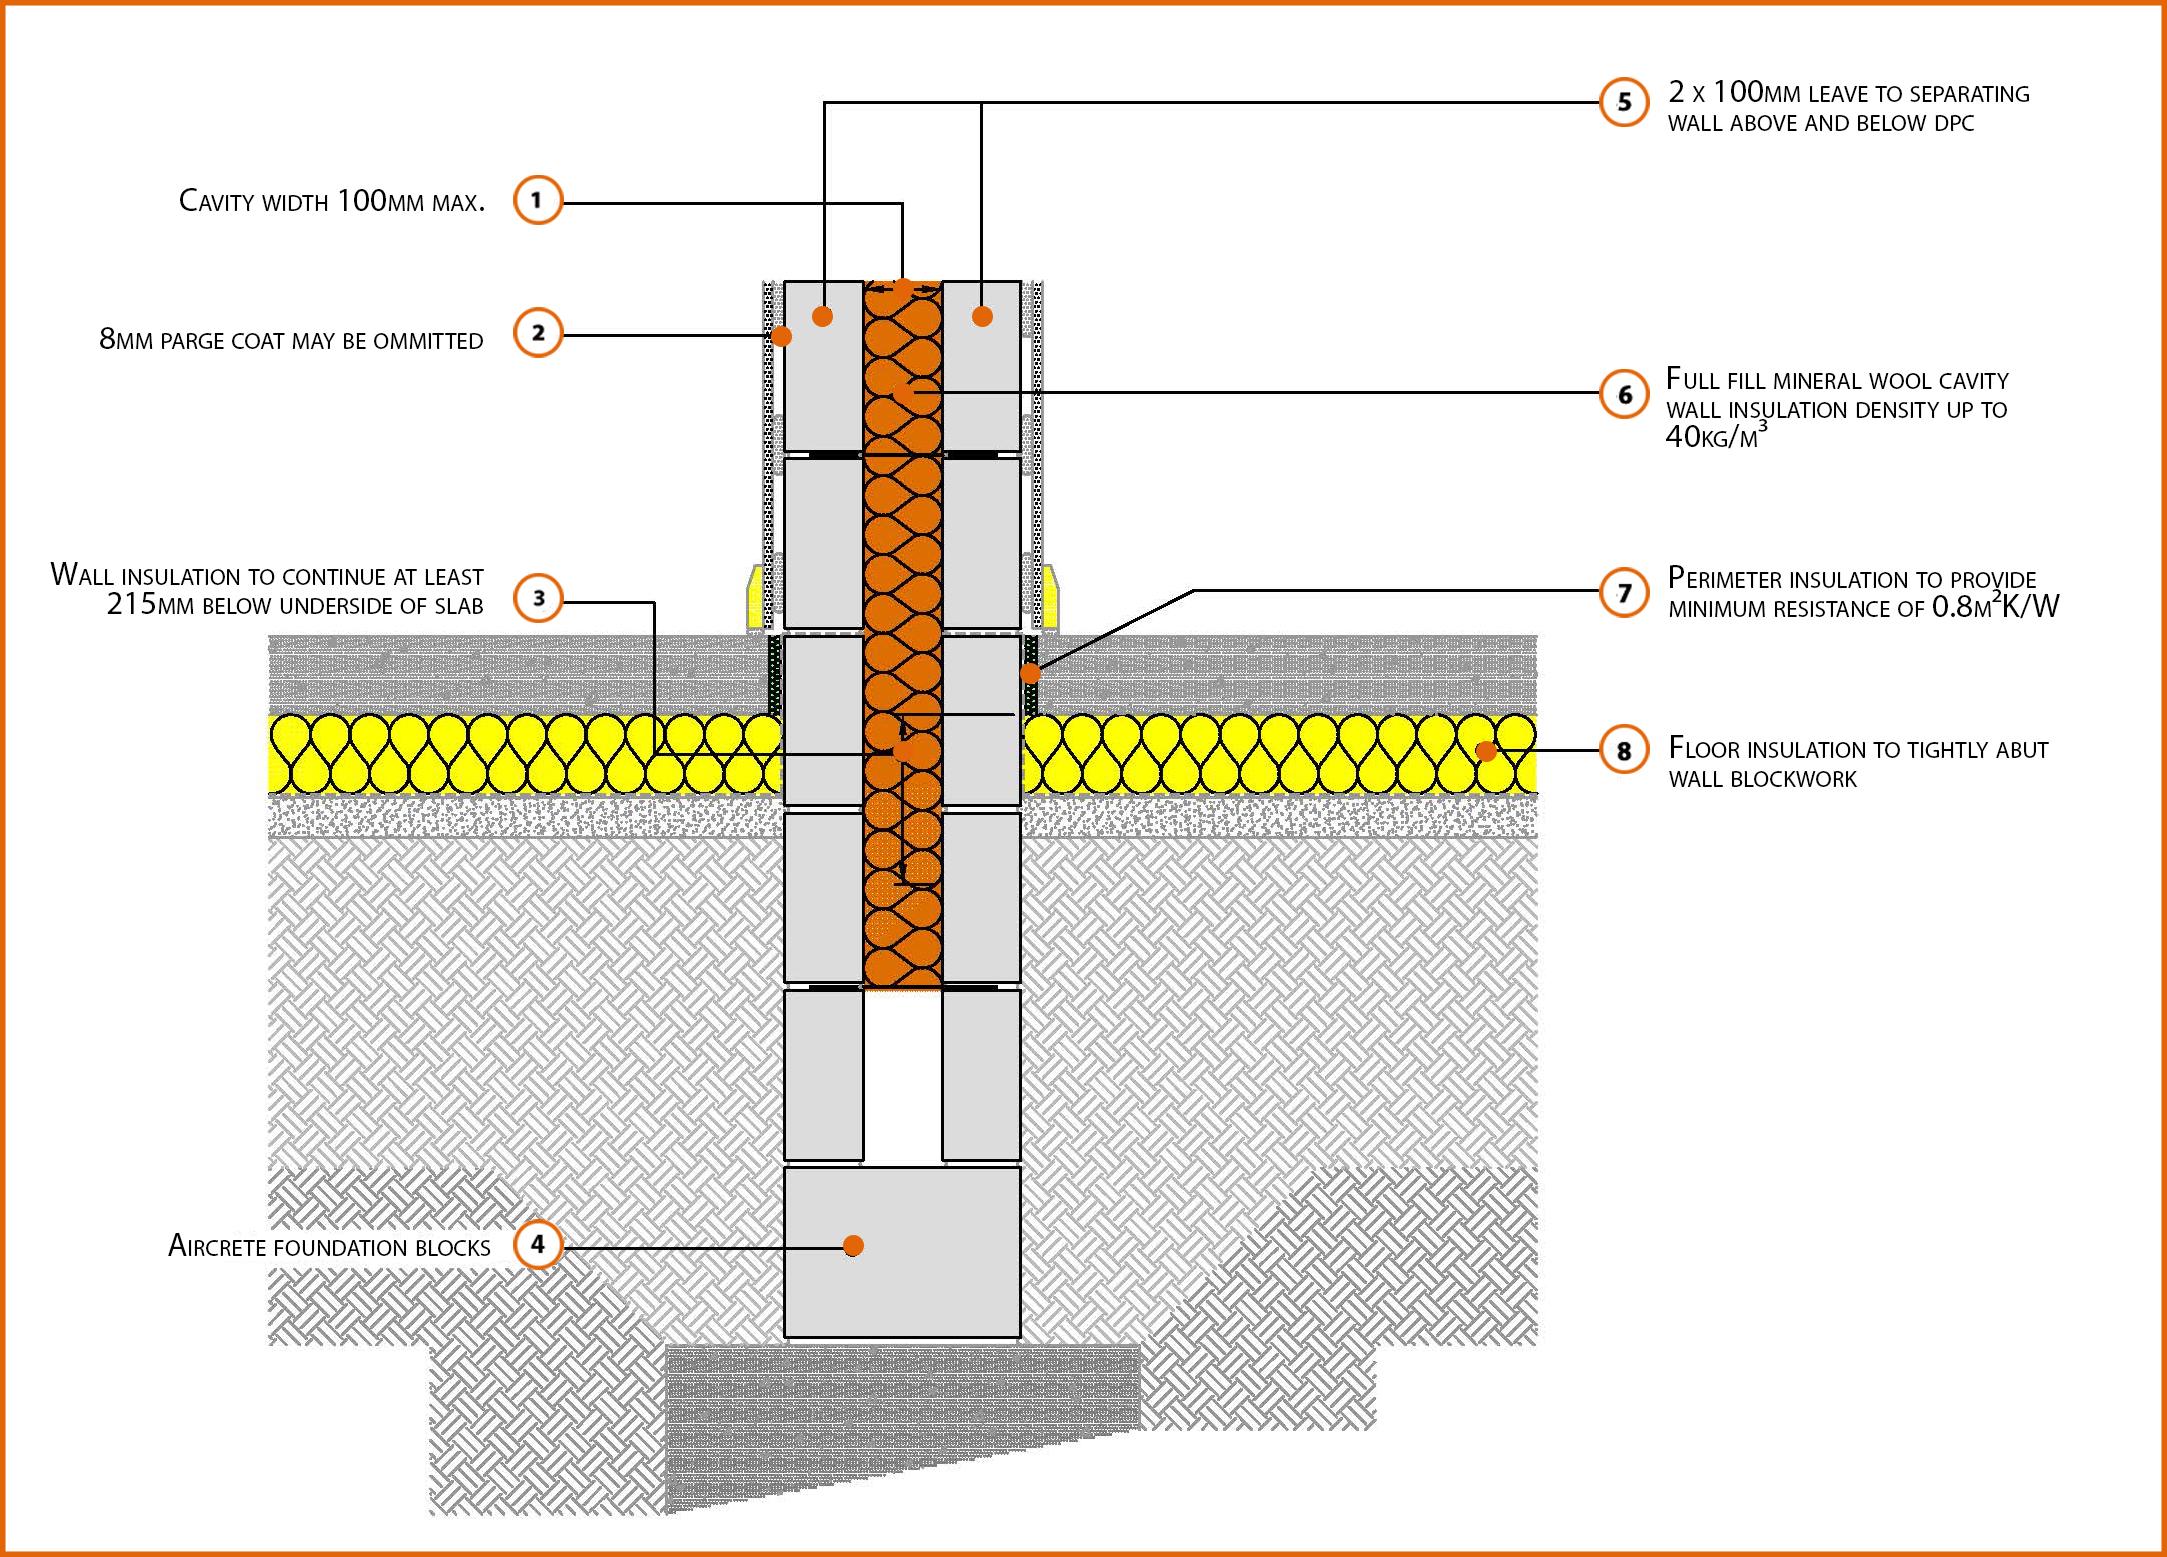 P1pcff6 In Situ Concrete Ground Bearing Floor Insulation